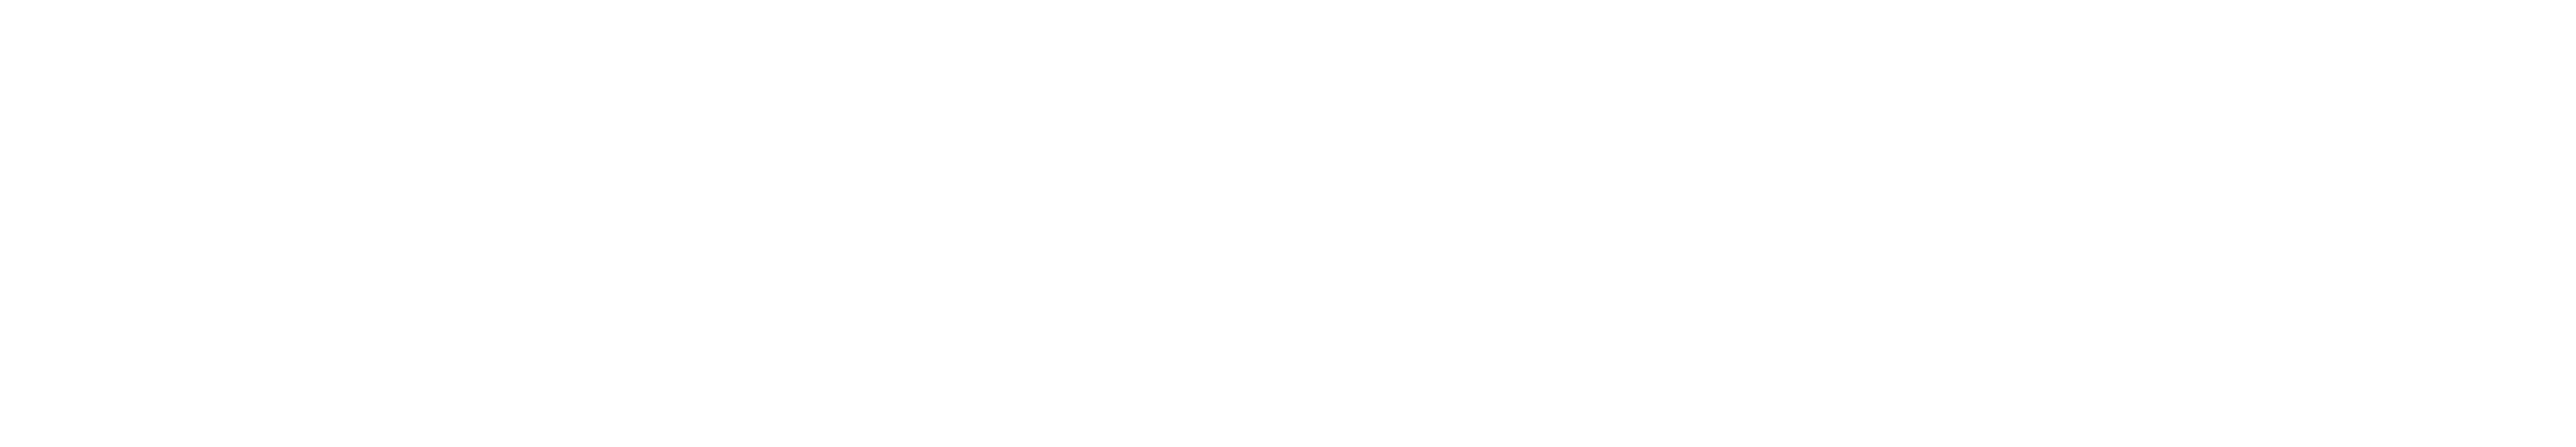 sr_software_logo_white